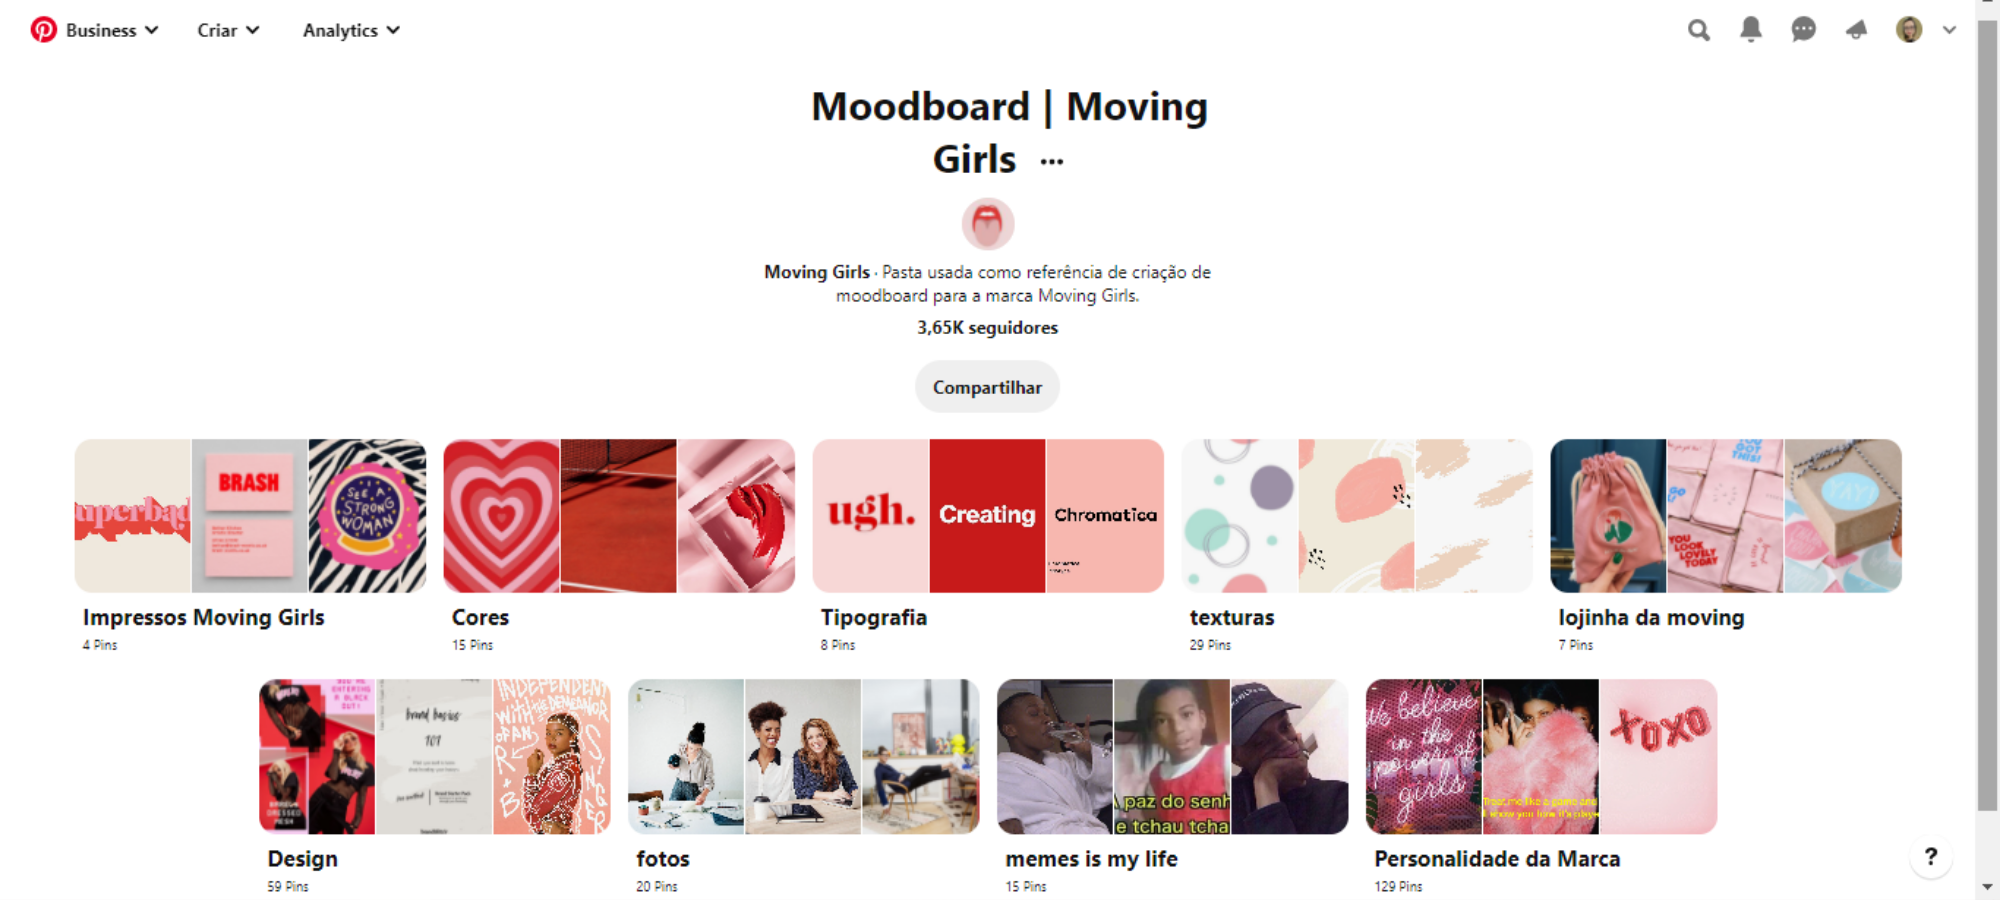 Moodboard Moving Girls no Pinterest